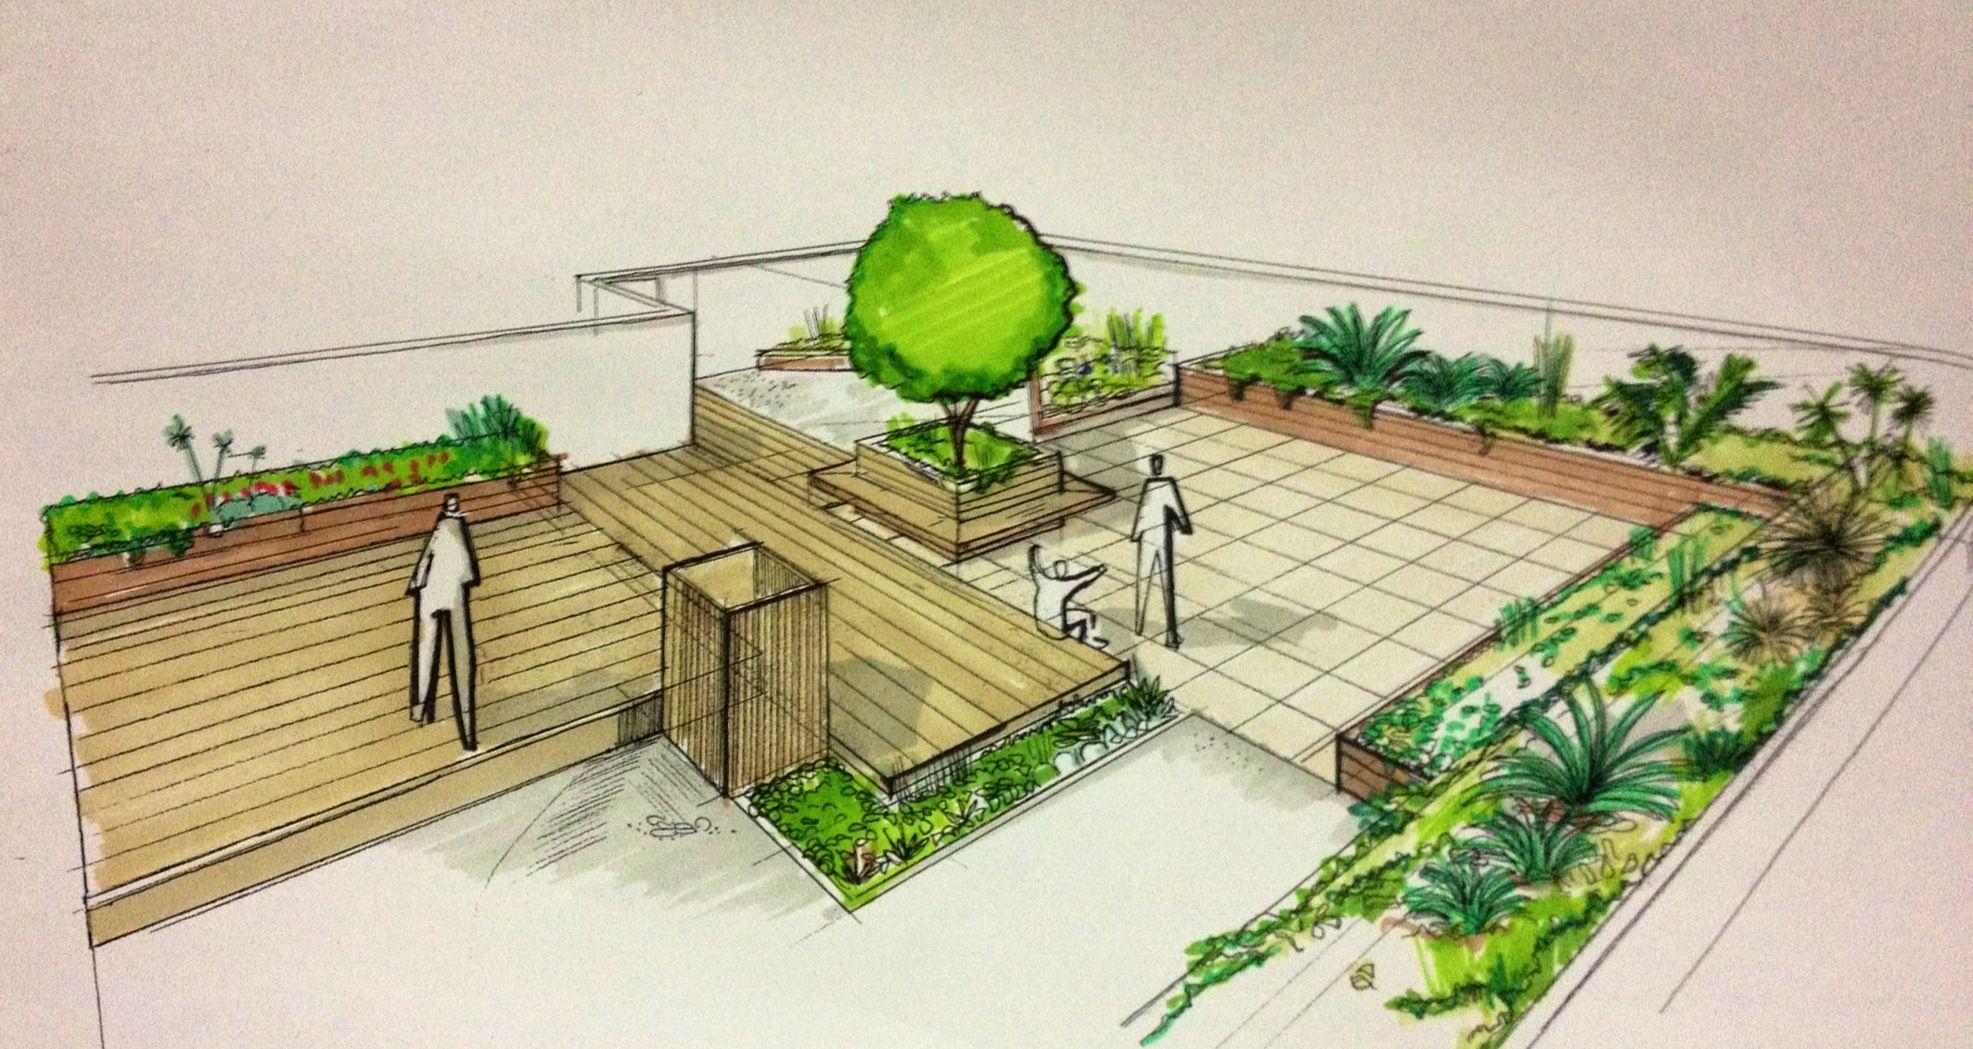 Sketch paisajismo terraza planos pinterest for Planos de jardines